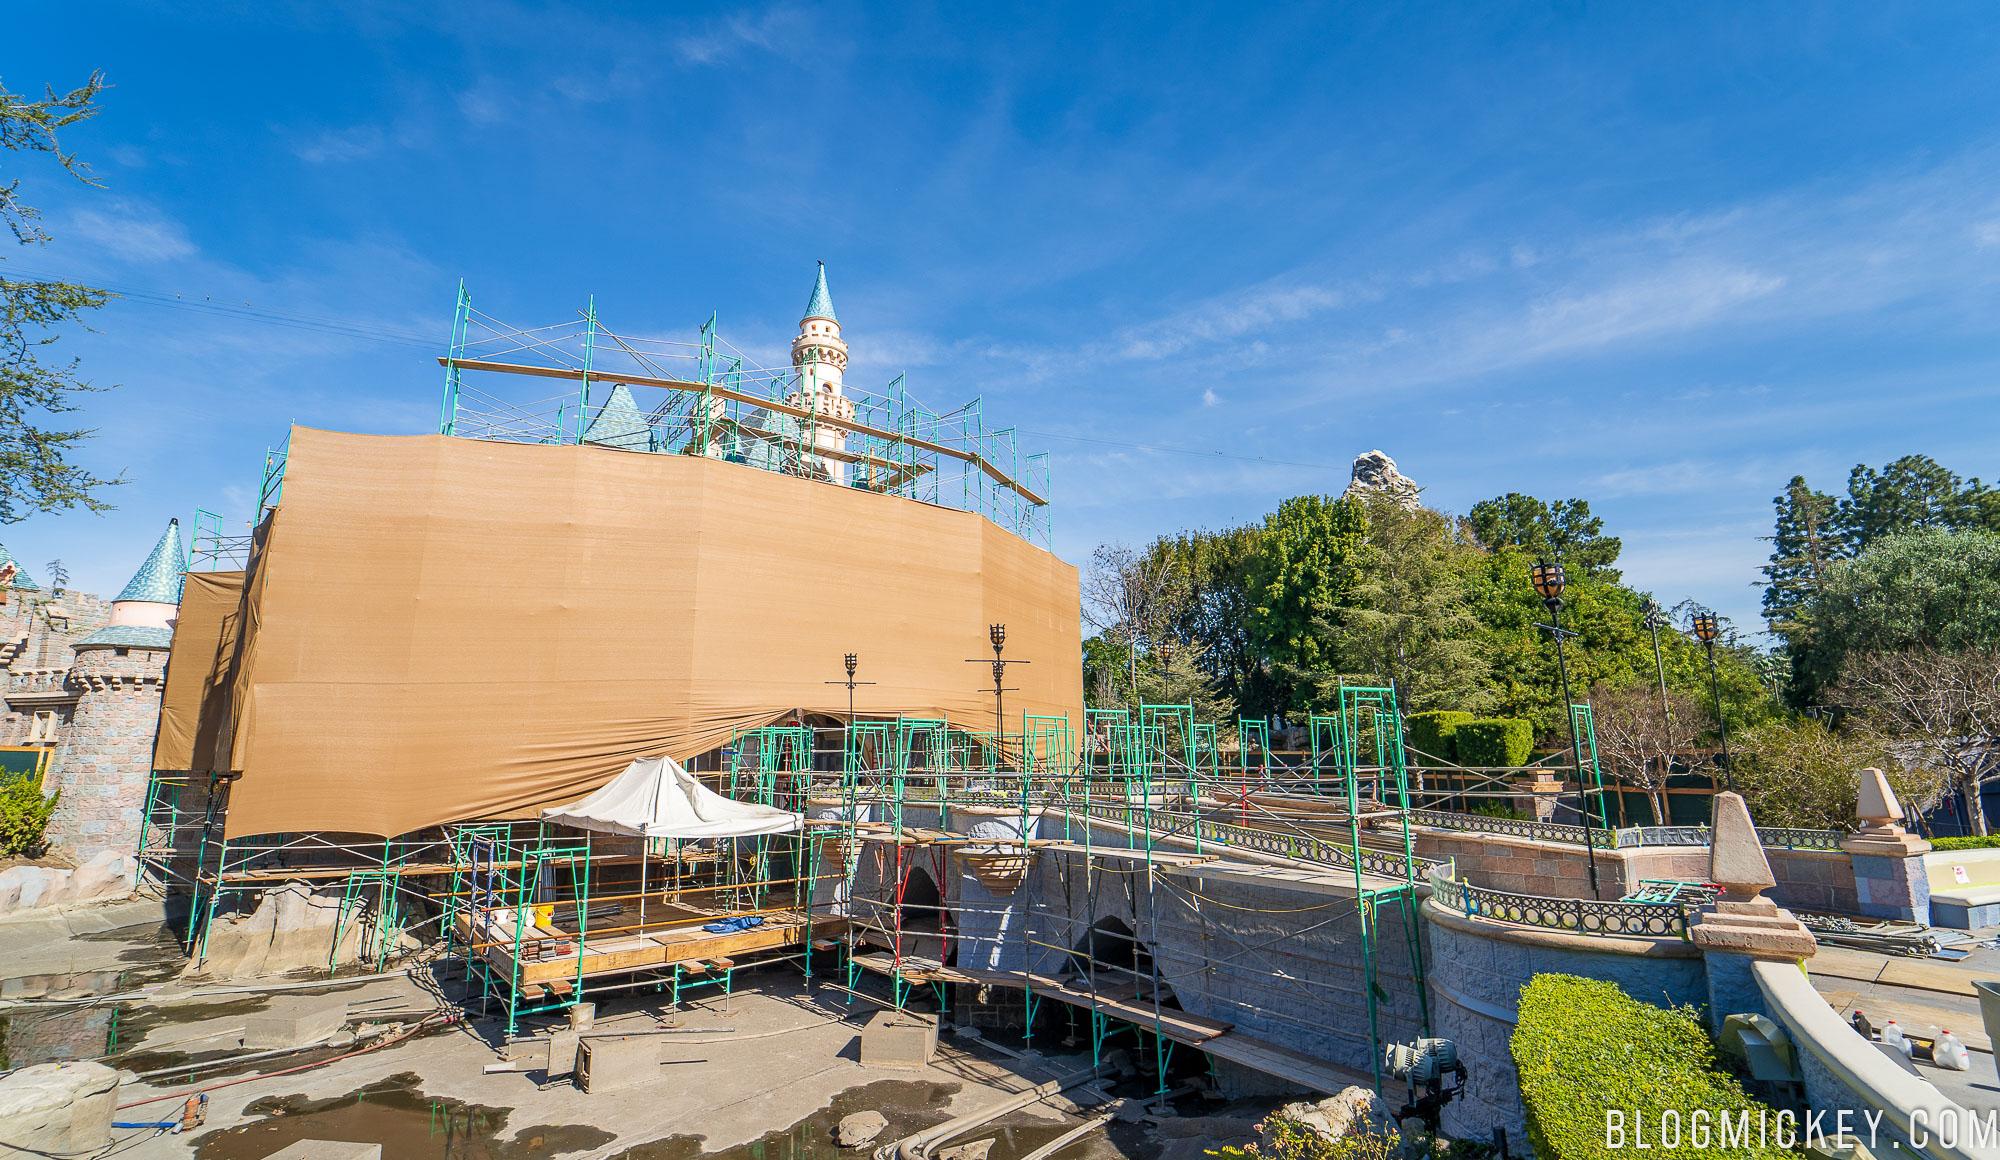 Photos Sleeping Beauty Castle Renovation Project At Disneyland January 2019